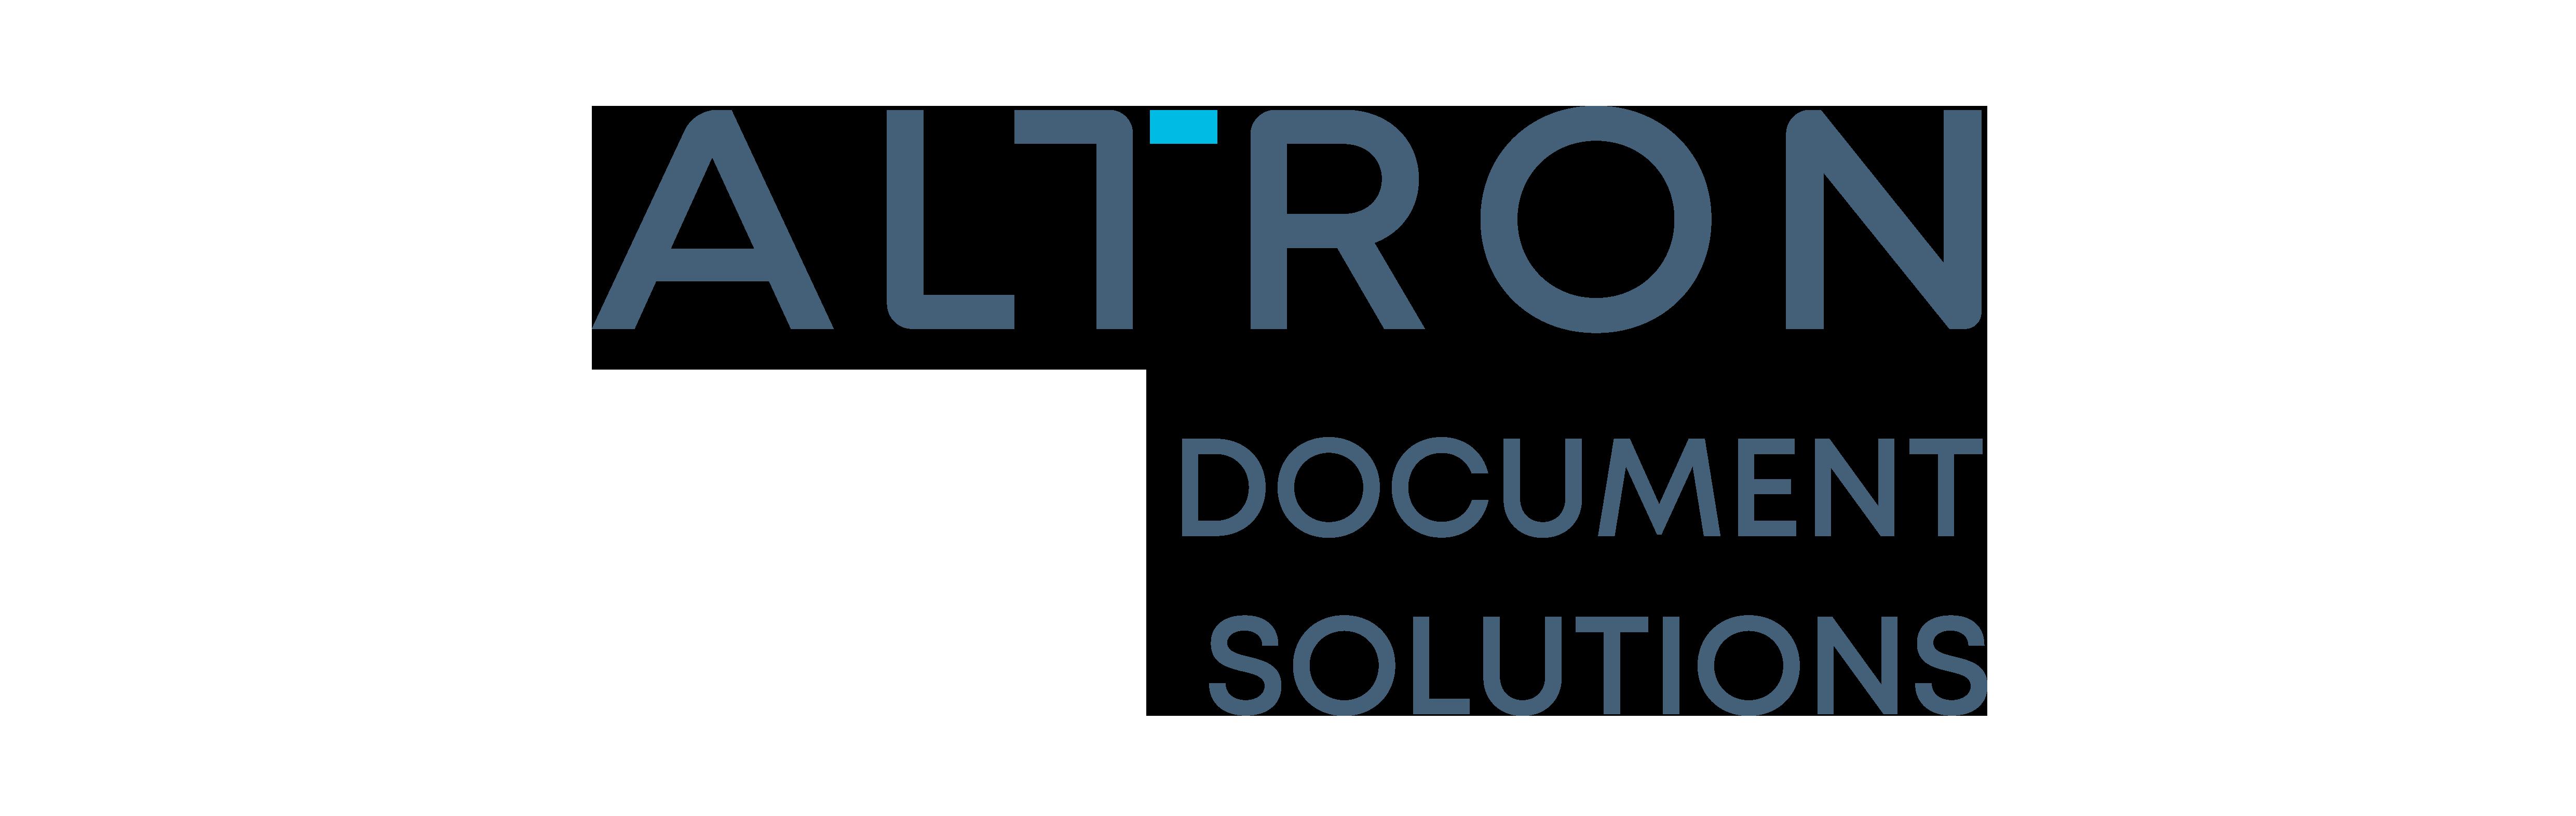 Altron Document Solutions